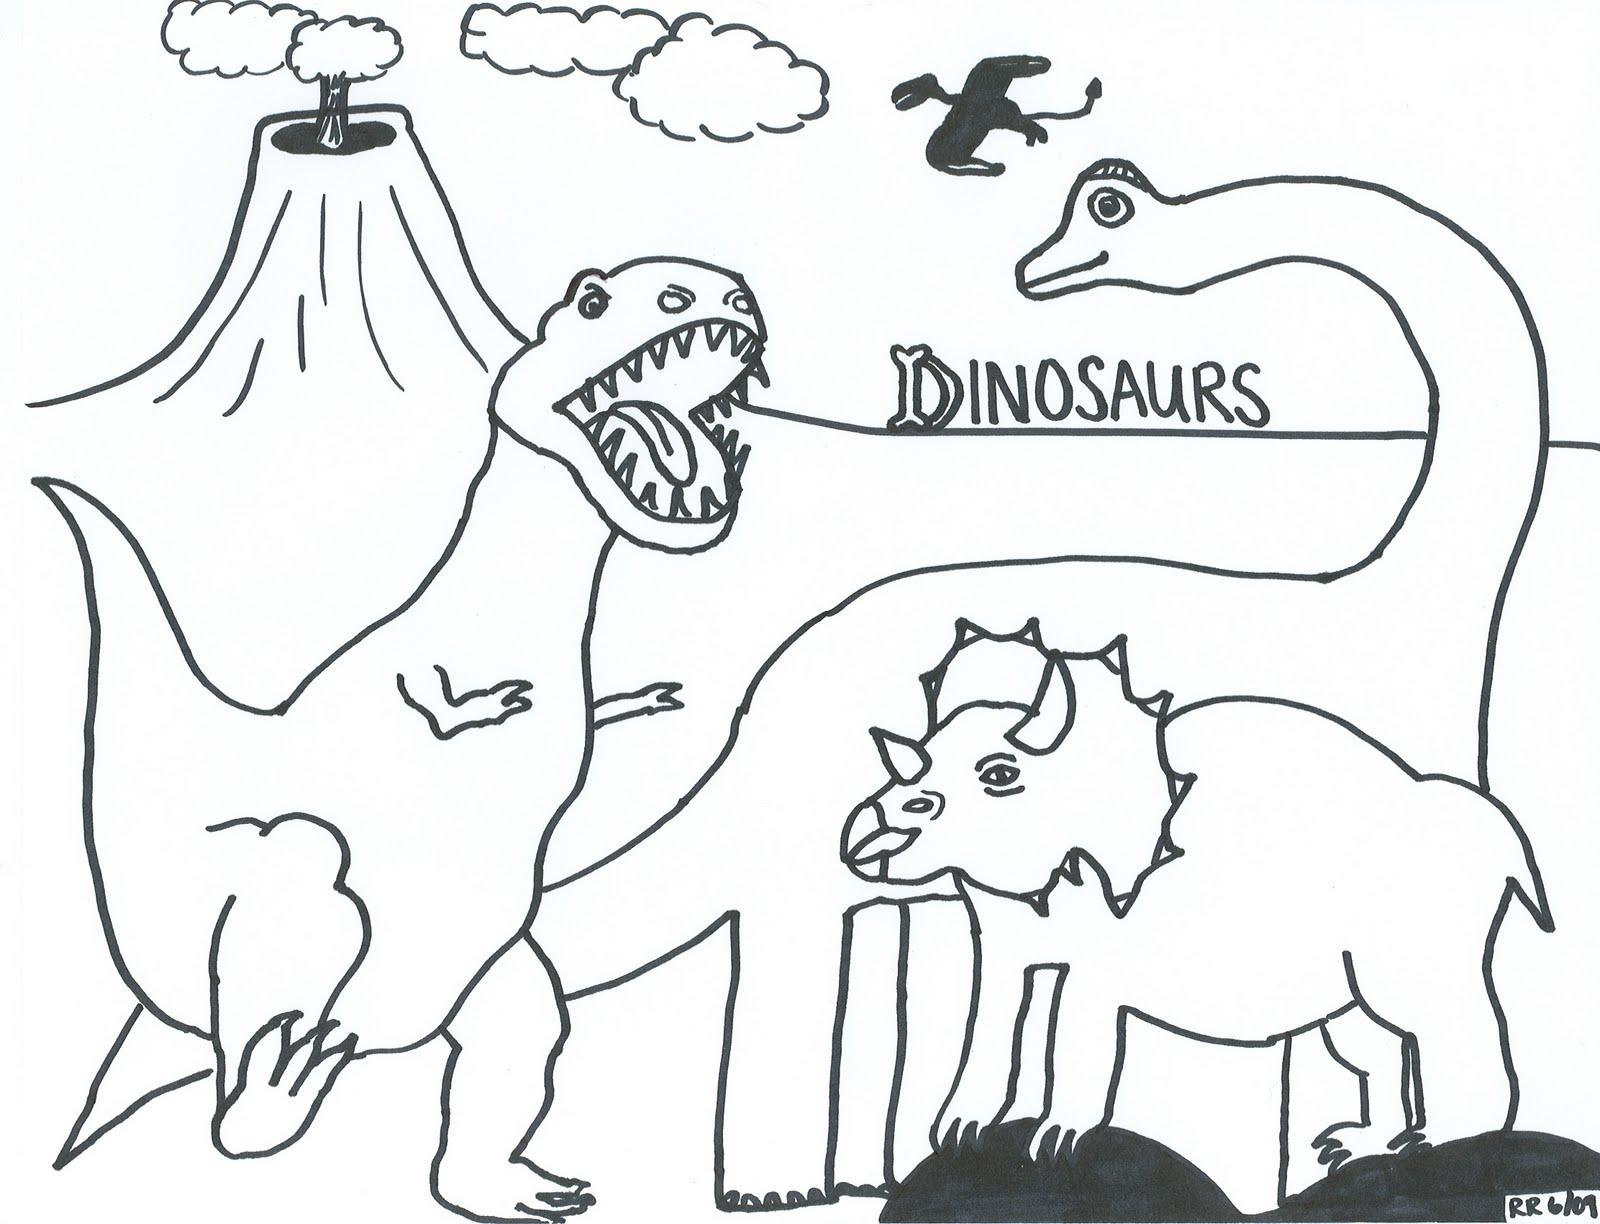 A Mad Dinosaur